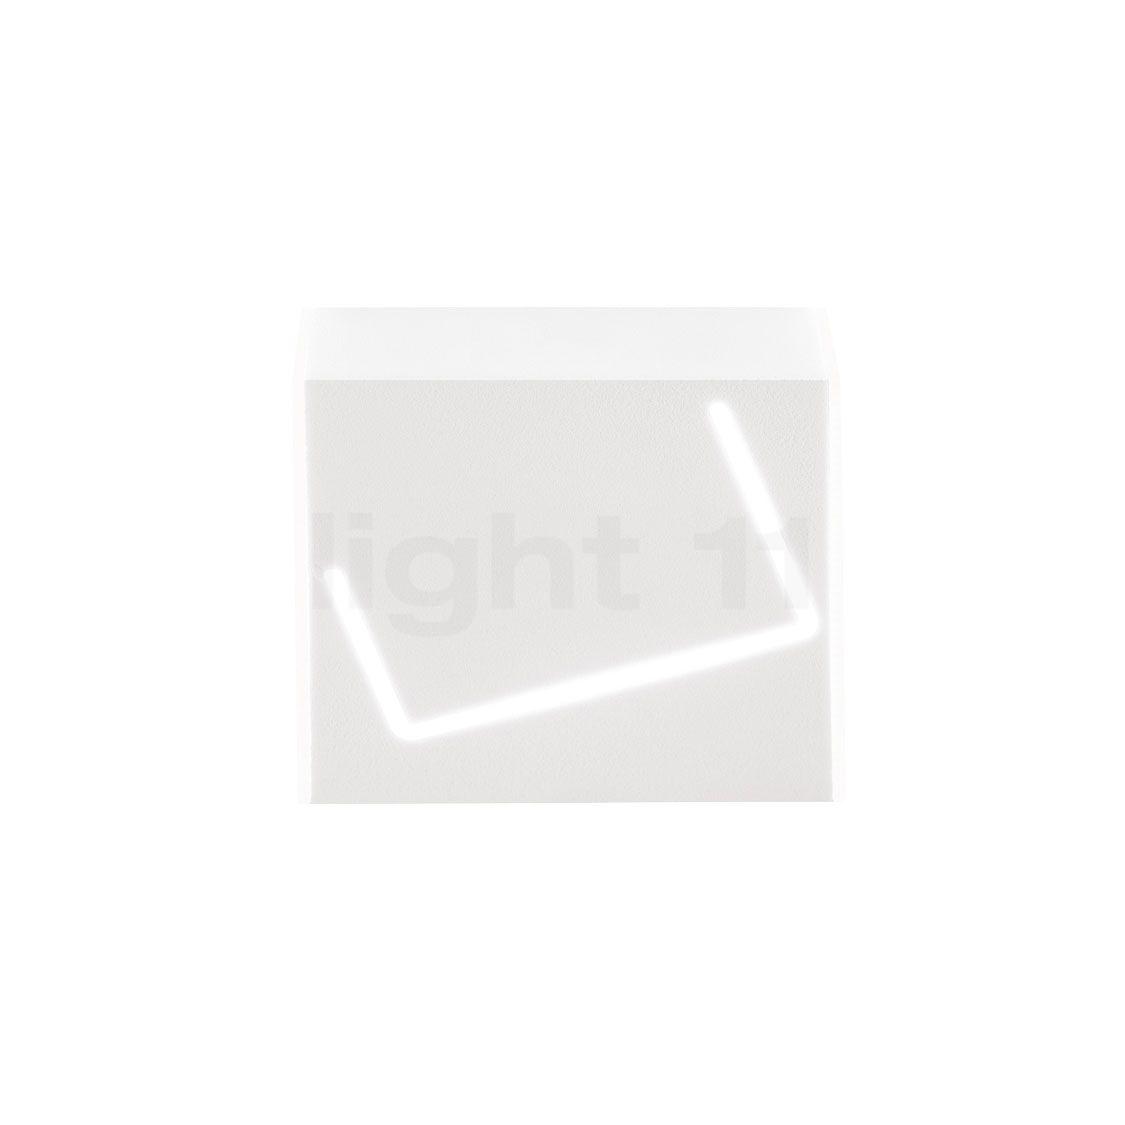 Fabbian Puà Wandleuchte LED, weiß , Lagerverkauf, Neuware F37 G01 01